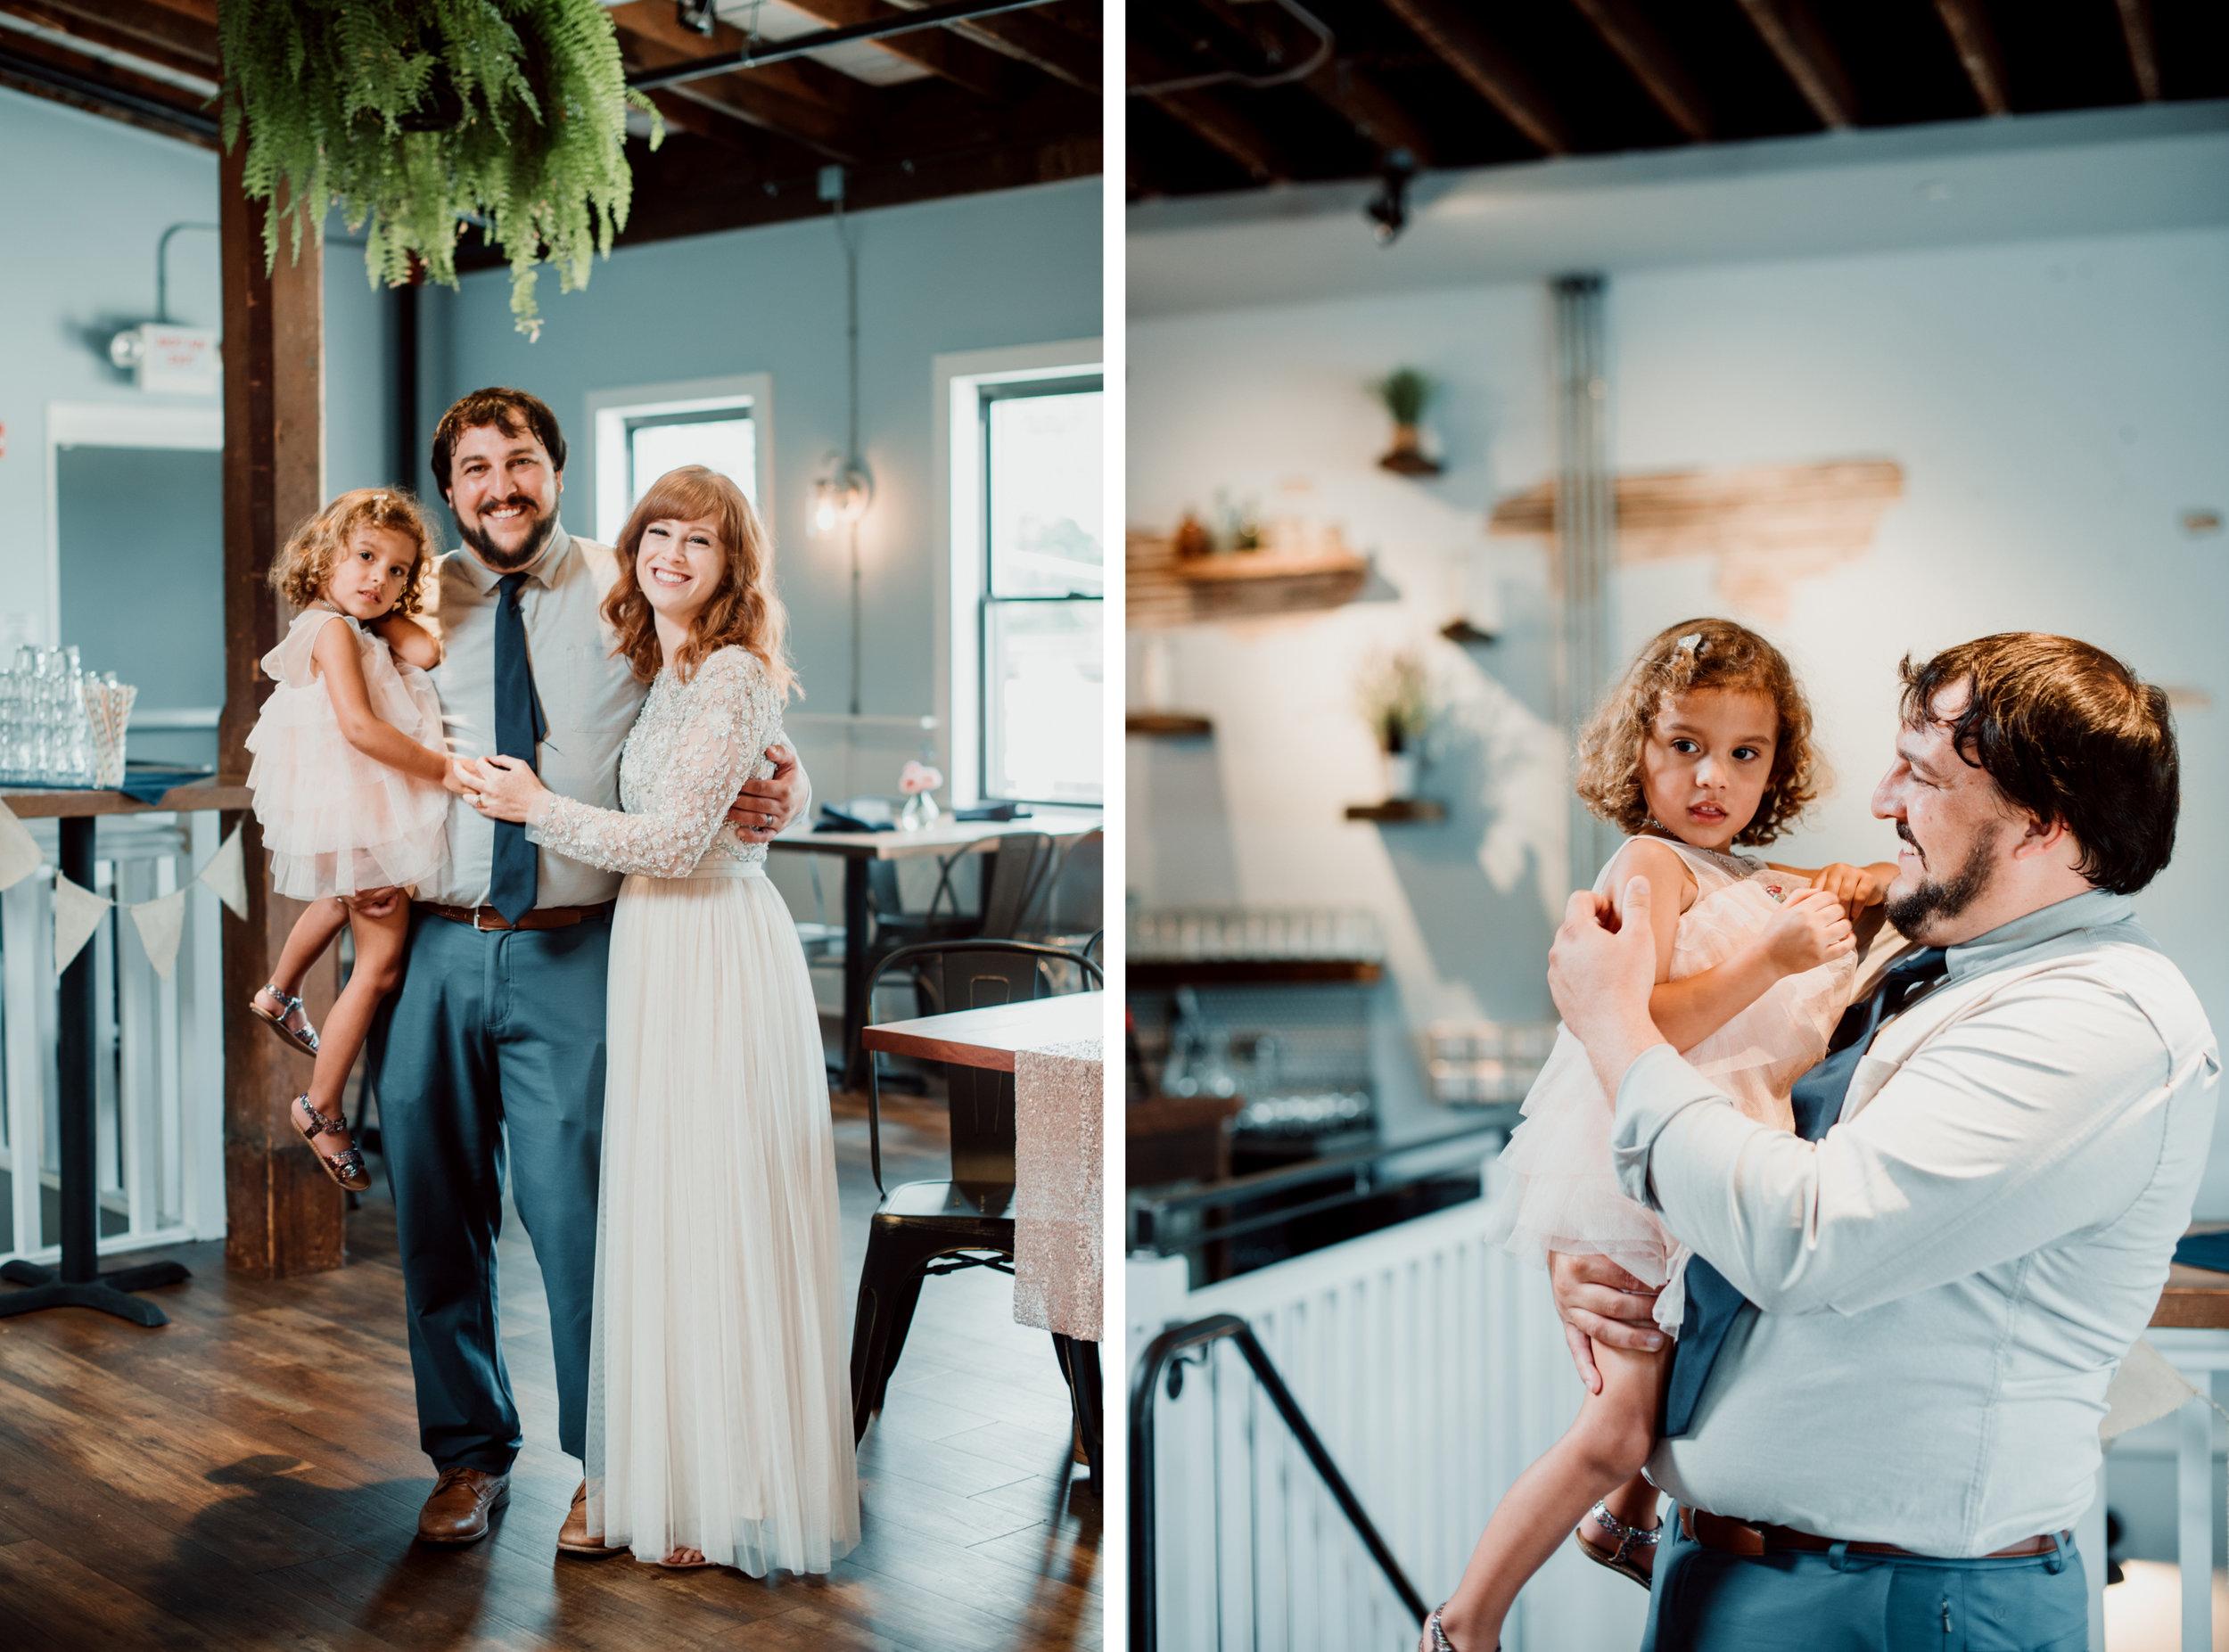 Philadelphia-wedding-photographer-la-cabra-brewery-diy-Peaberry-Photography-013.jpg